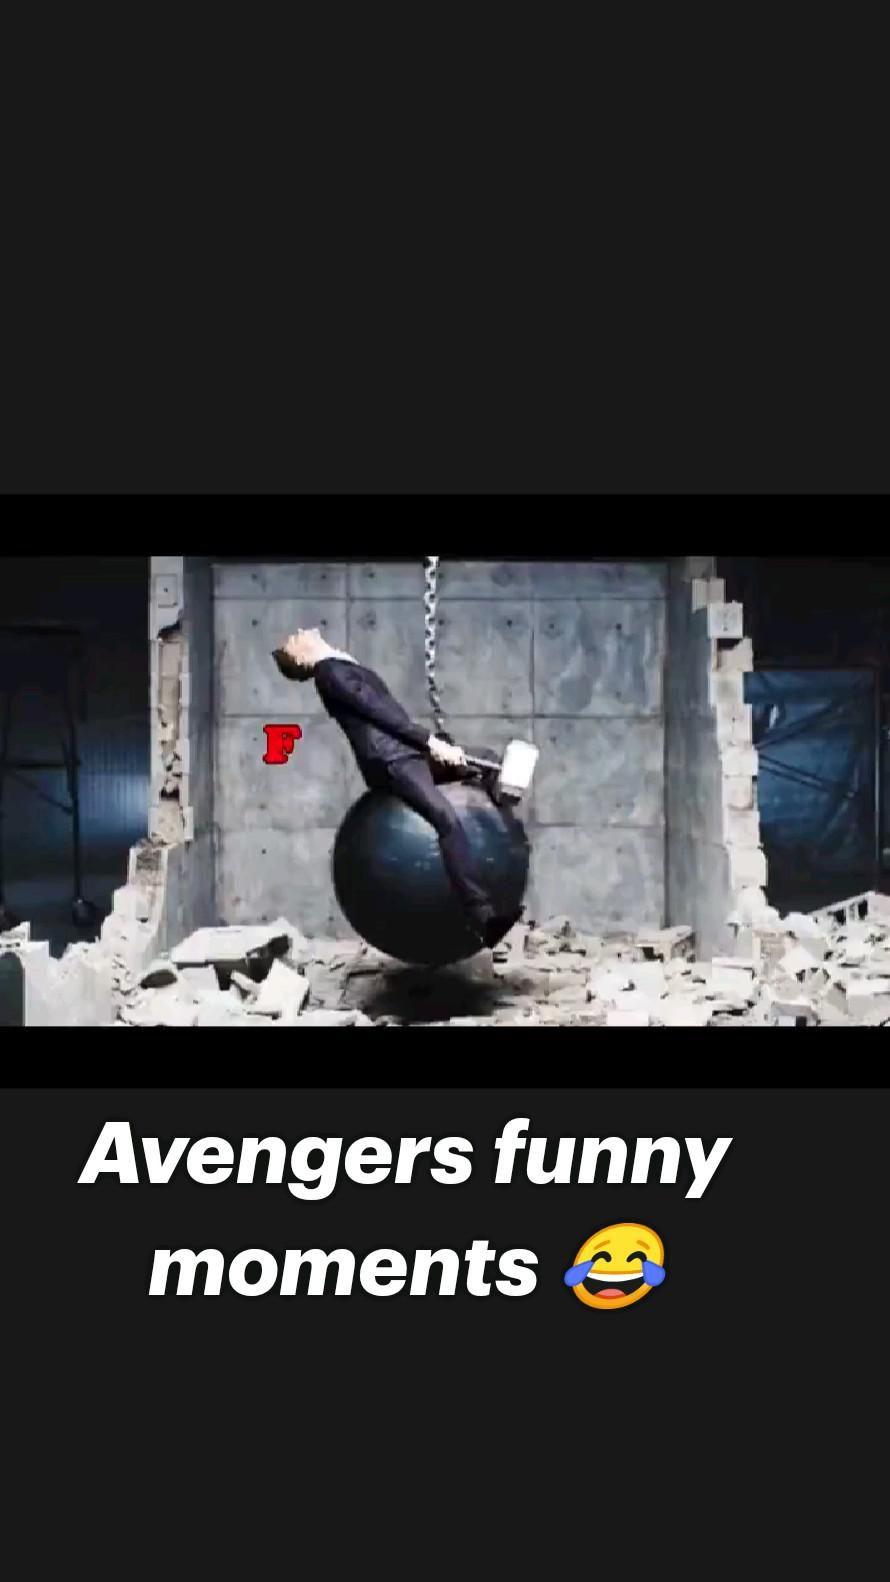 #avengers funny moments 😂#avengersedit #marvel #marveledits #funnyavengers #fyp  #marvelfunny